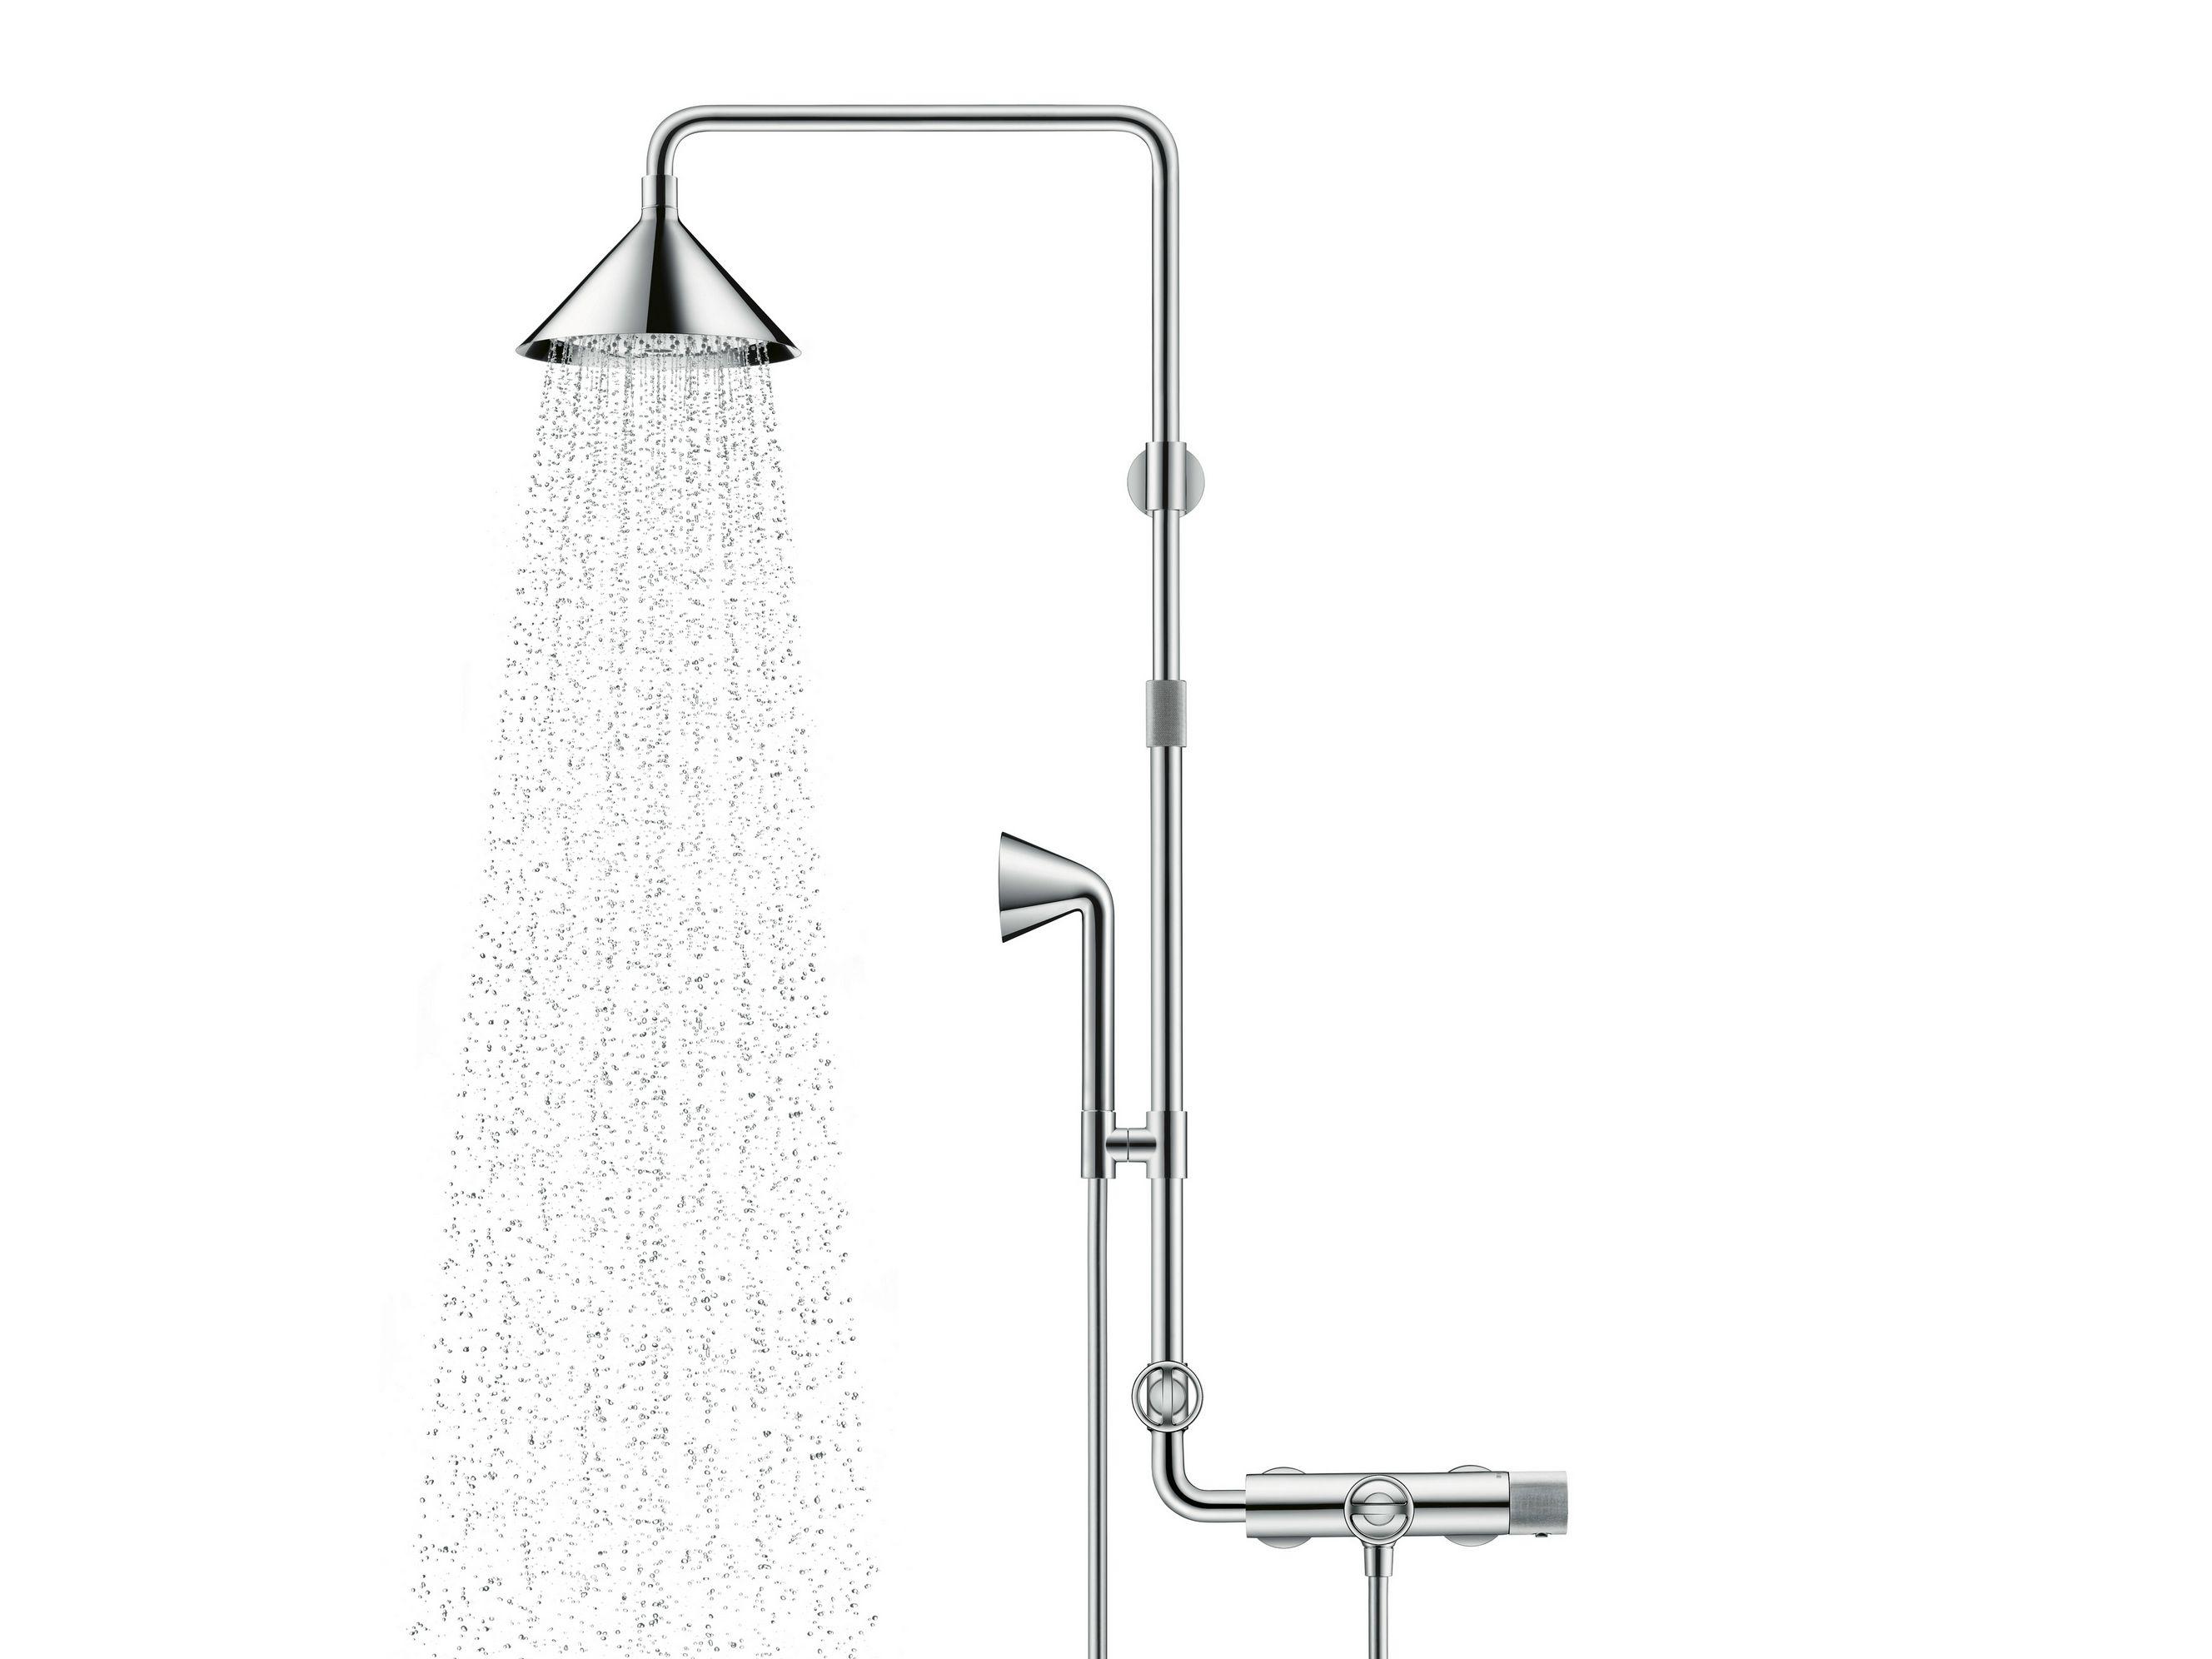 Accessoires Salle De Bain Axor ~ stainless steel shower panel axor shower pipe by hansgrohe design